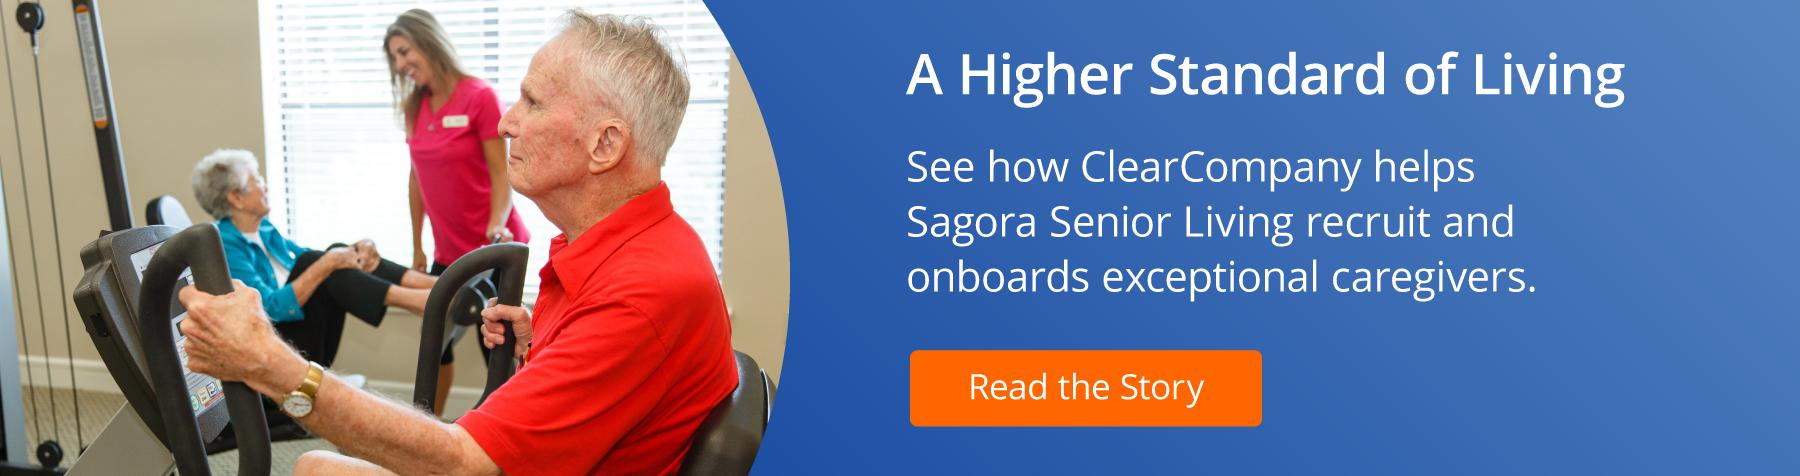 Sagora Senior Living Case Study_Clear Company